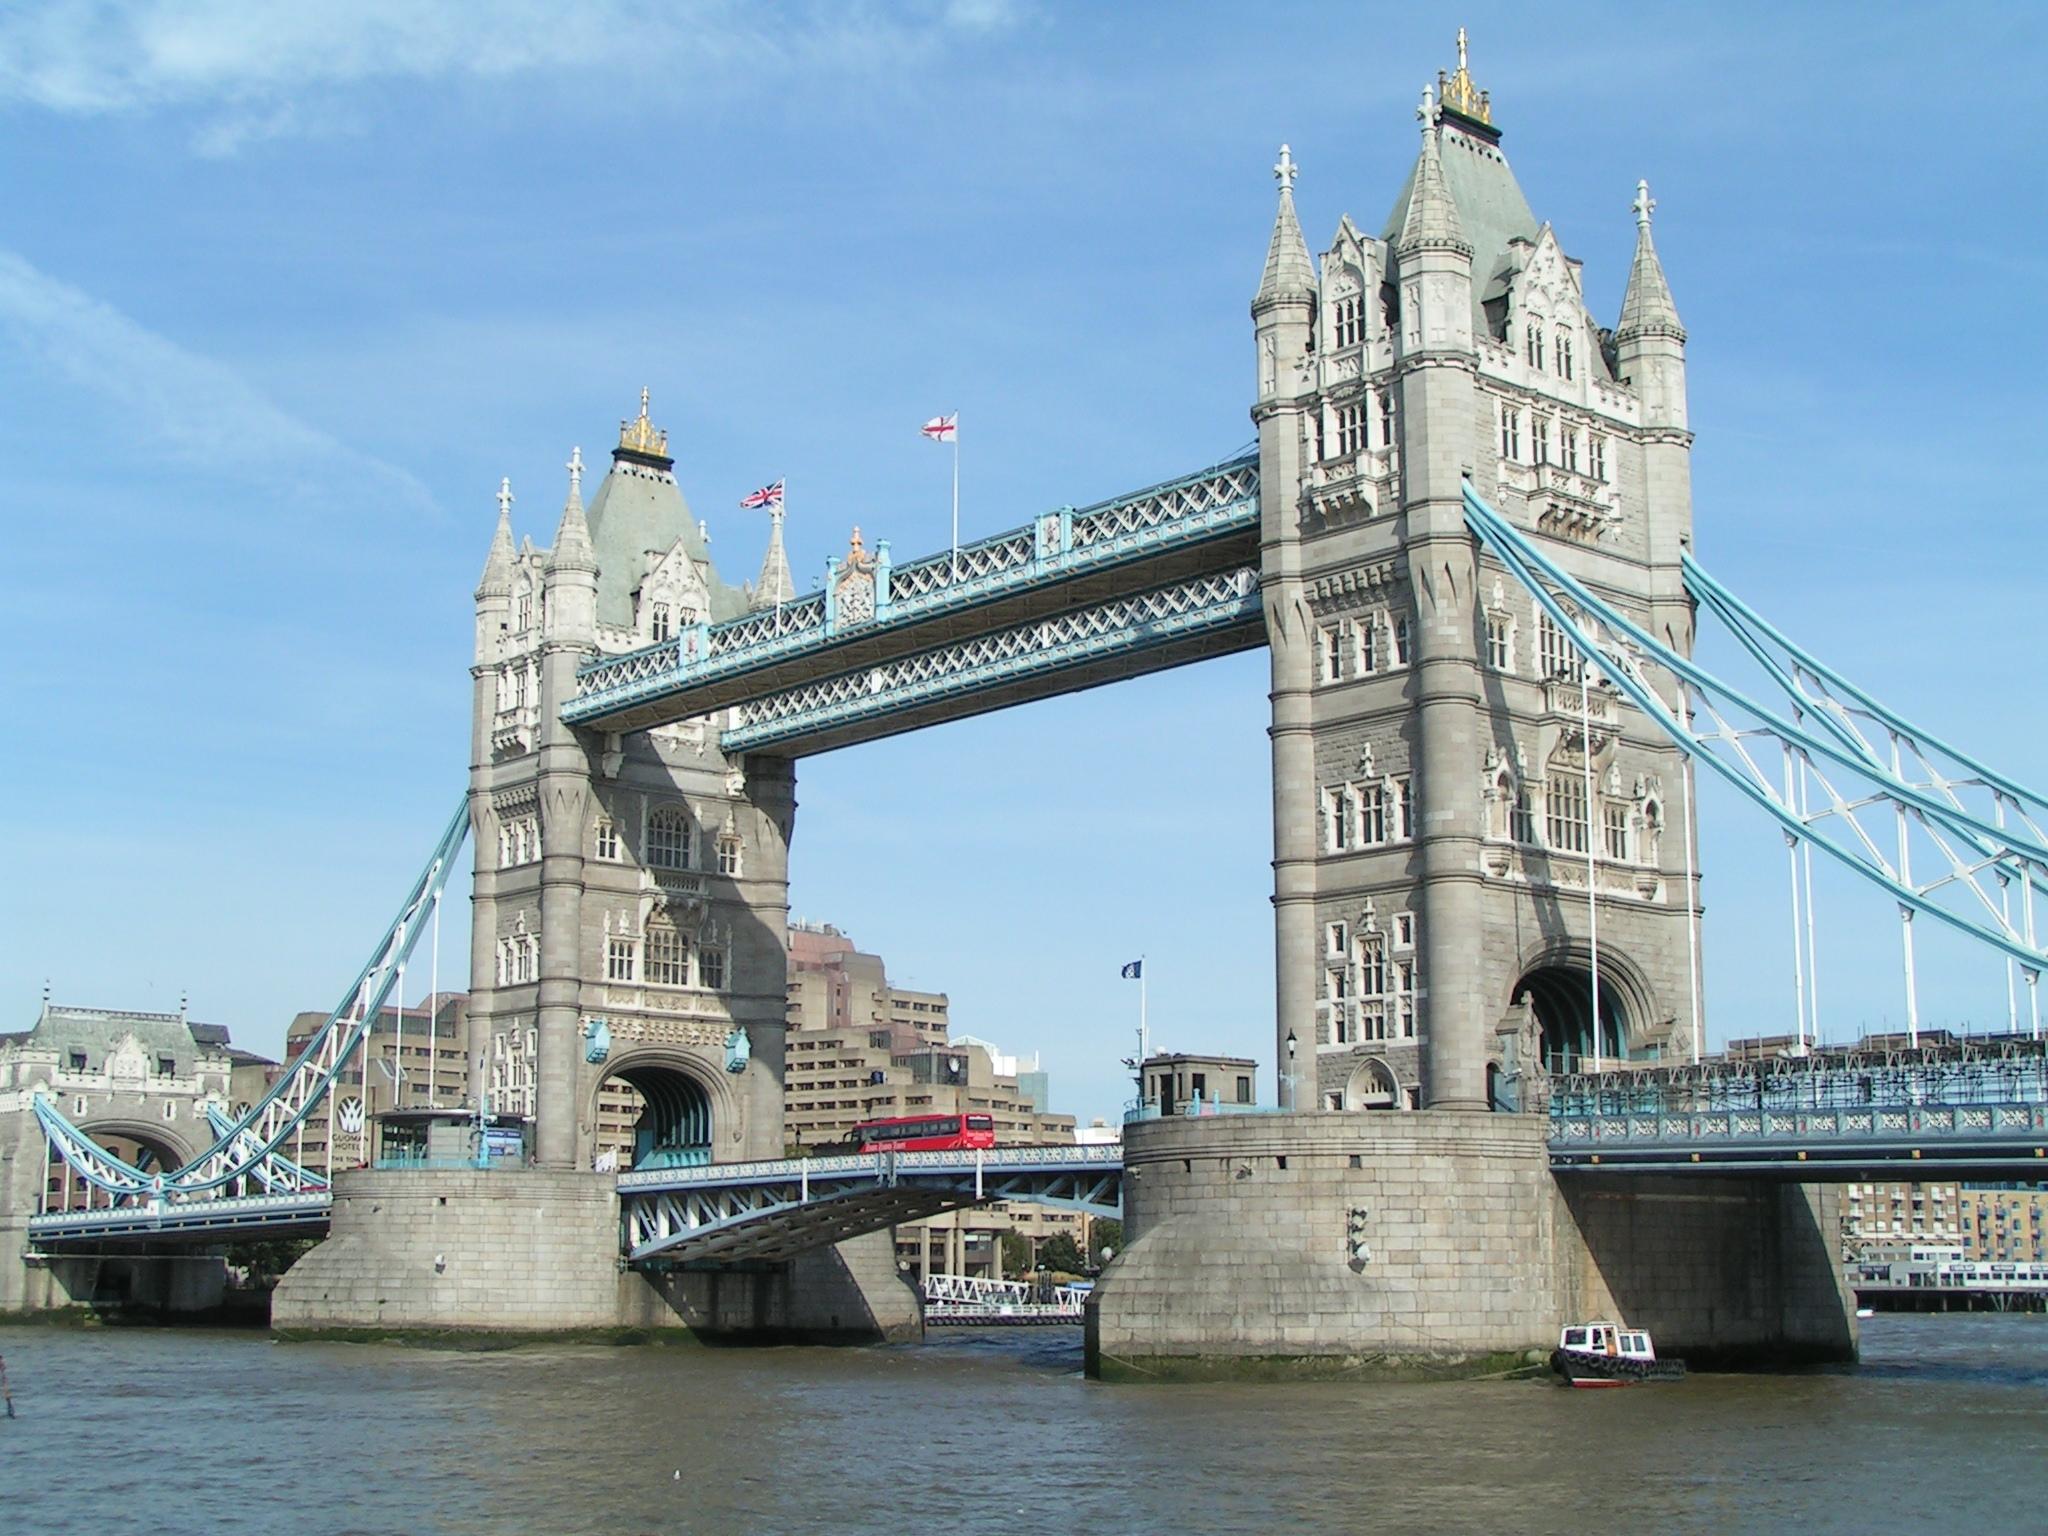 Tower Bridge, Bascule Bridge in London - Travelling Moods